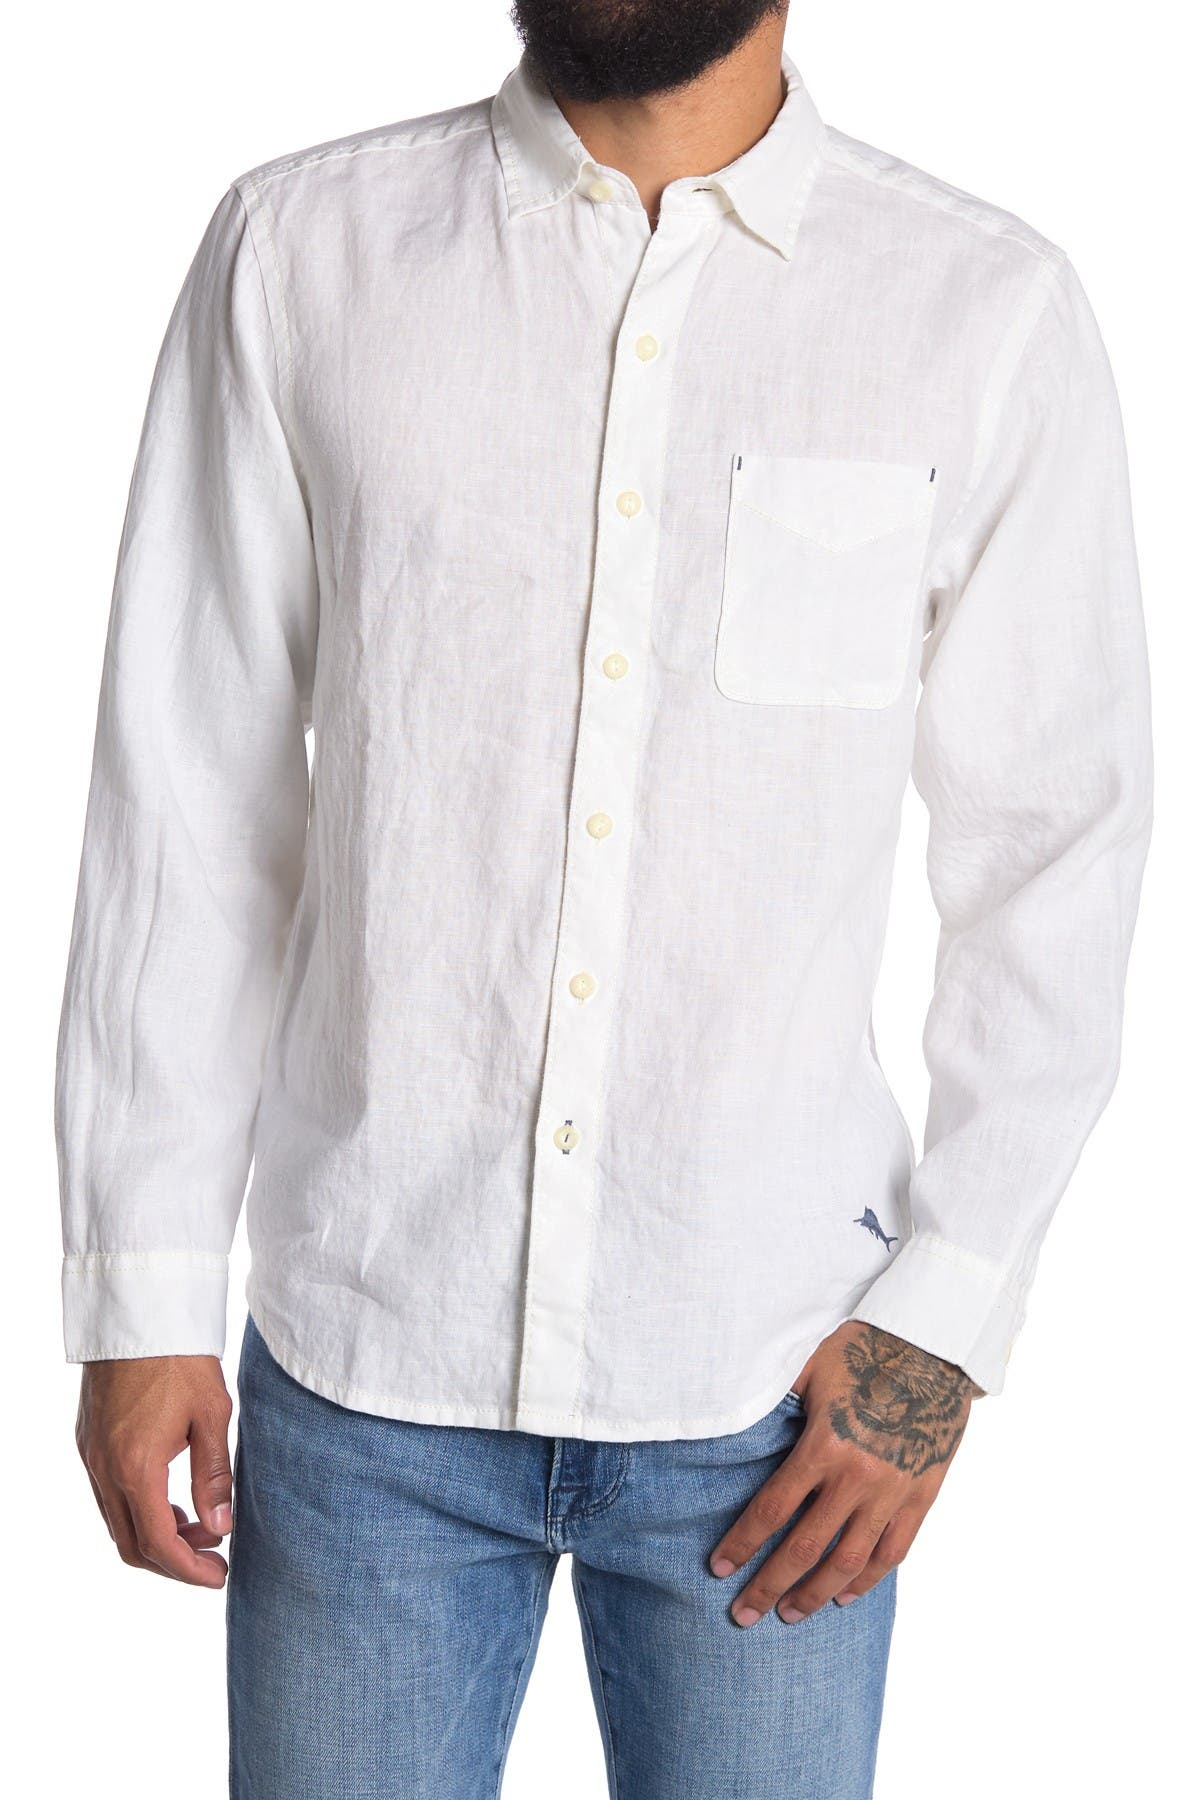 Image of Tommy Bahama Passport to Paradise Long Sleeve Regular Fit Shirt